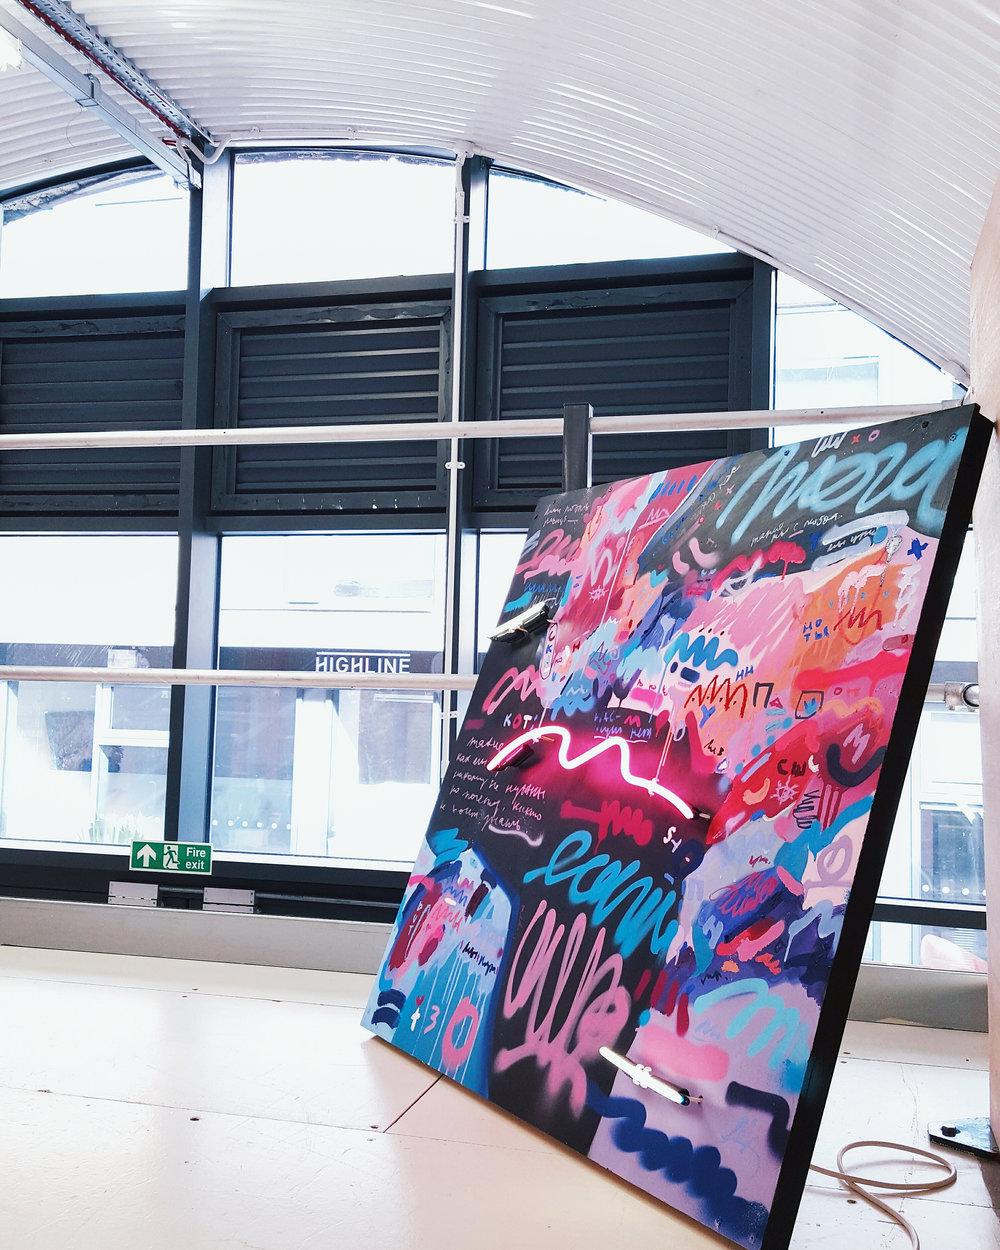 Vertigo , 100x100cm, acrylic, spray paint, oil pastel and neon on board